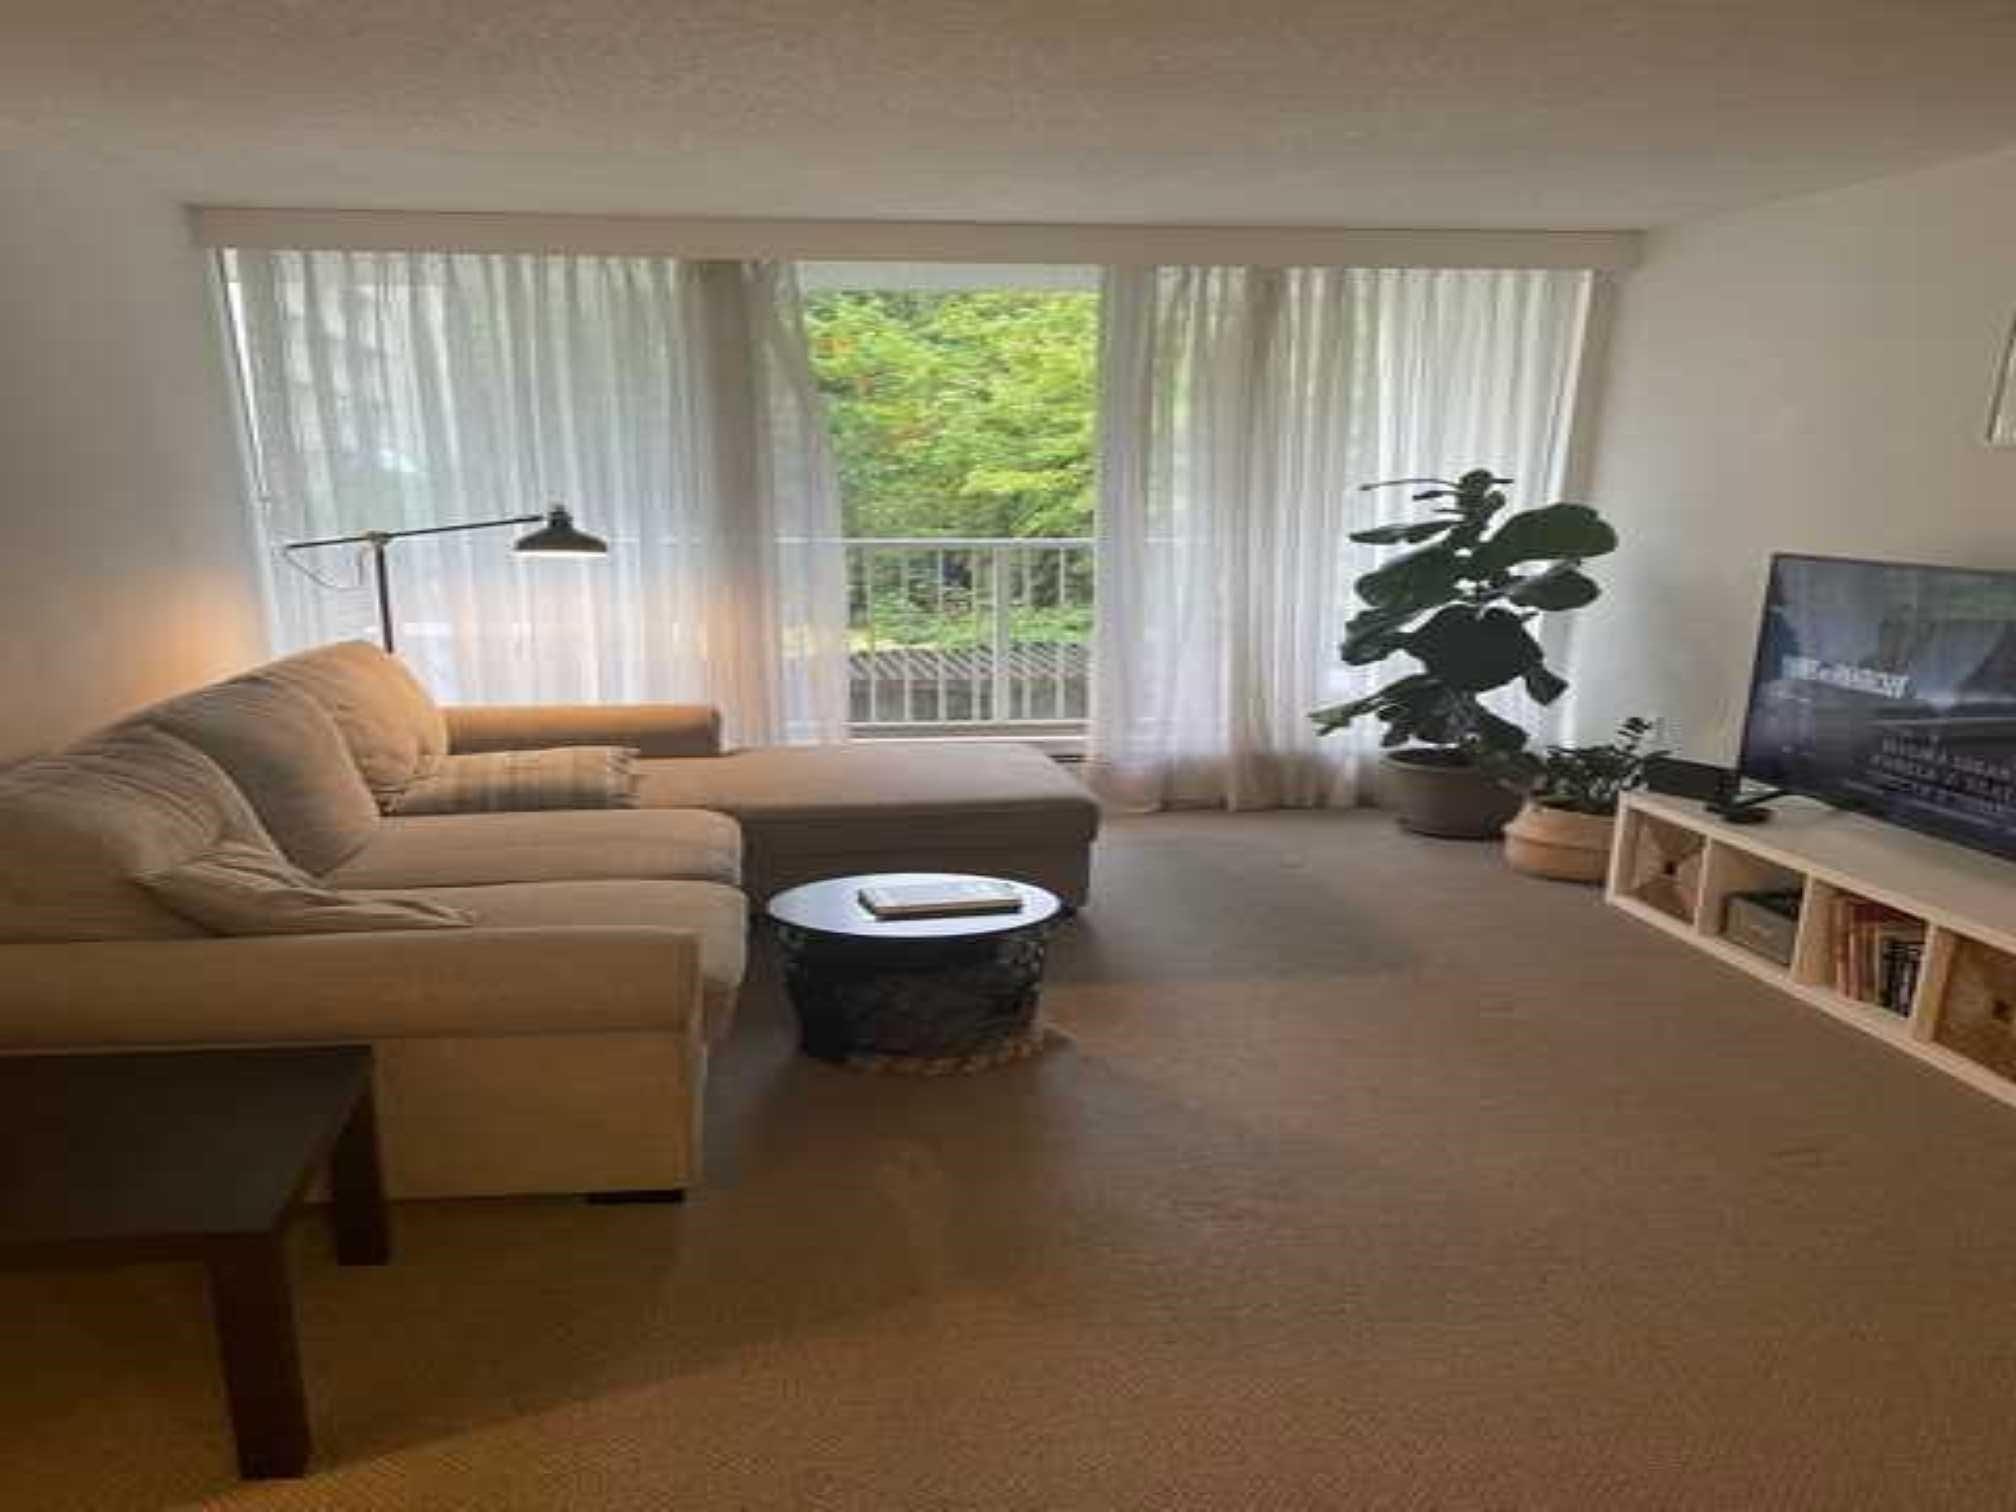 305 2004 FULLERTON AVENUE - Pemberton NV Apartment/Condo for sale, 2 Bedrooms (R2621764) - #14